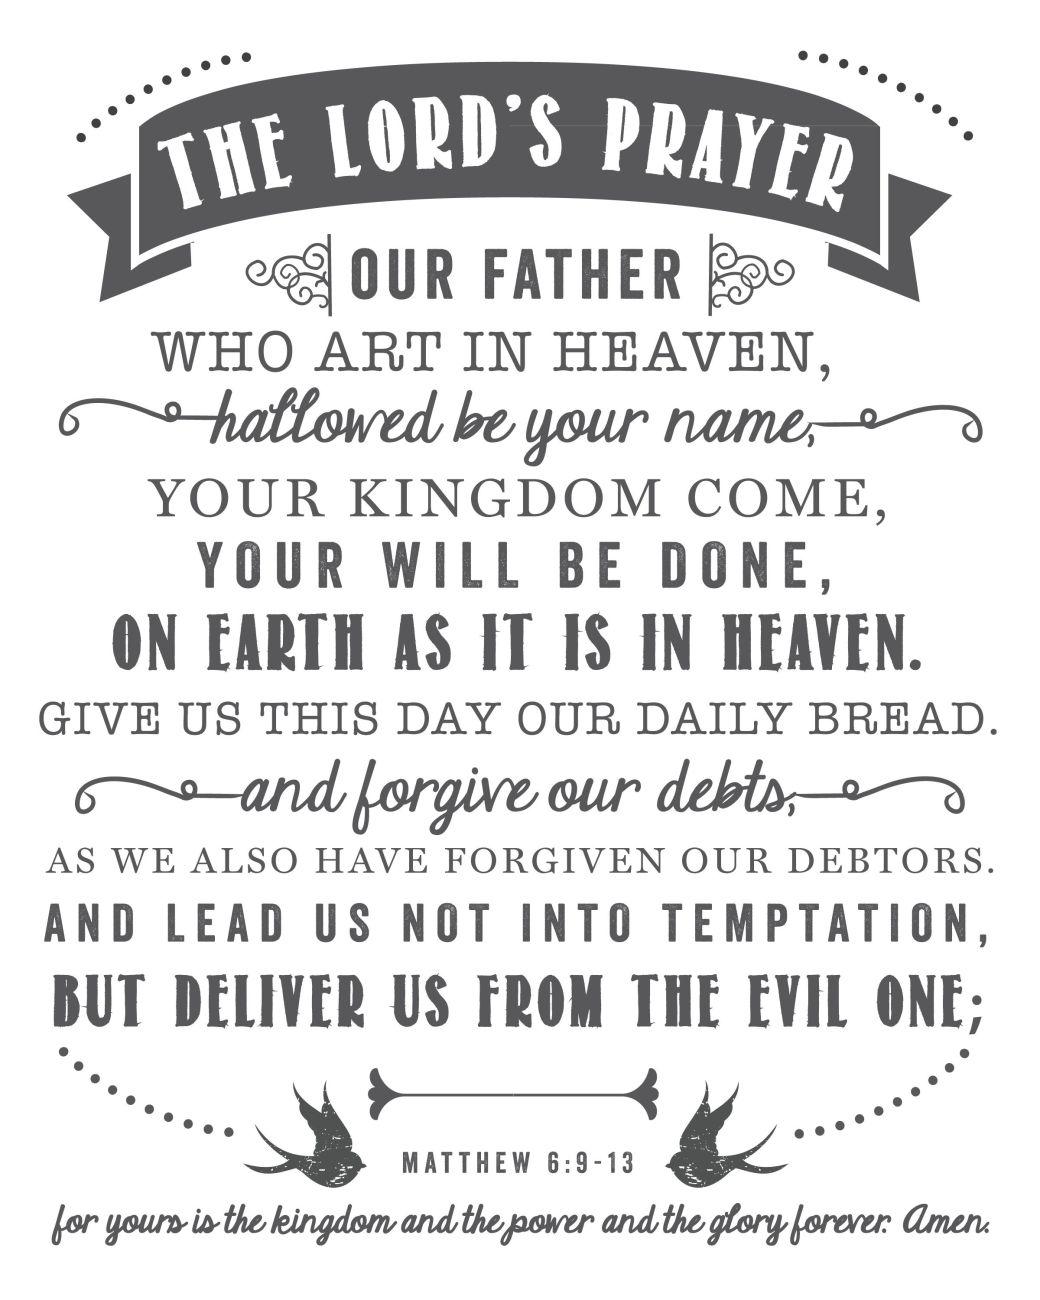 Lord's Prayer.jpg